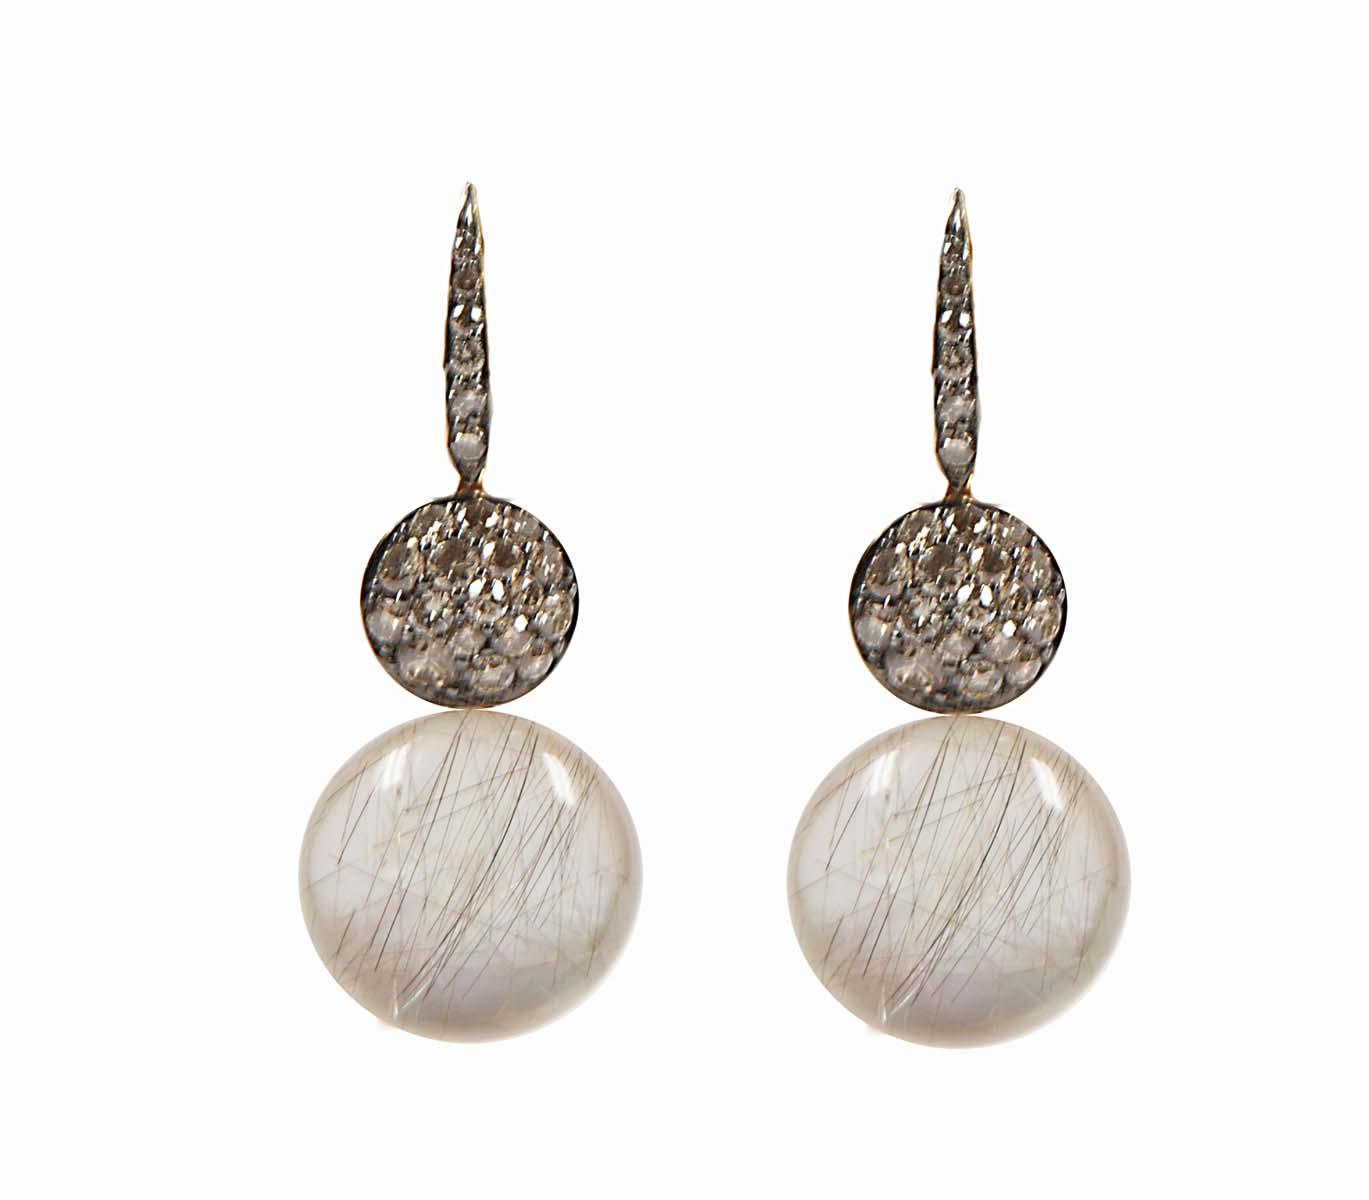 18 k rose gold earrings with Rutilated Quartz